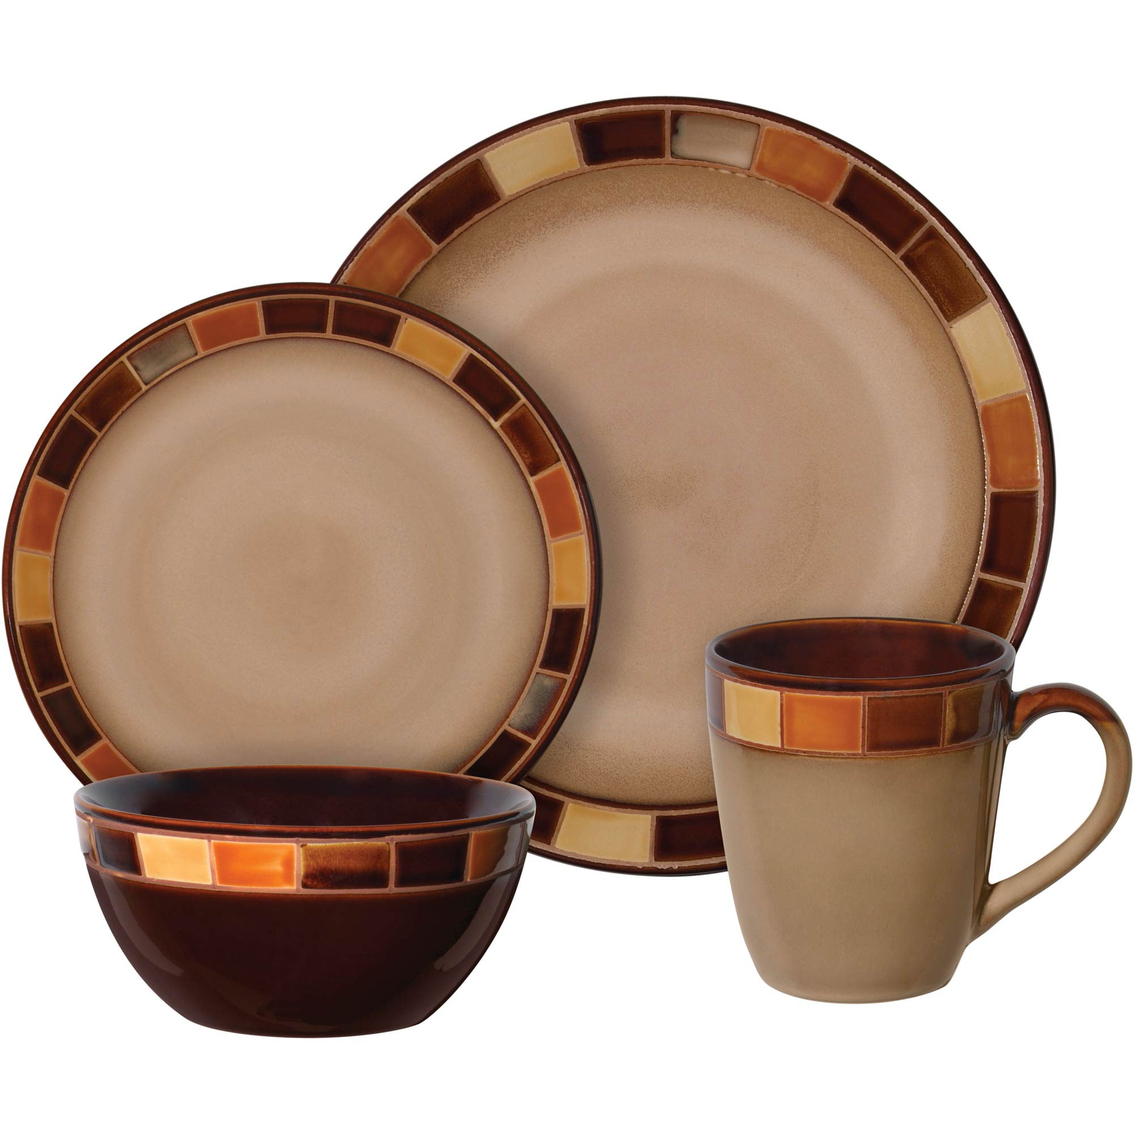 1423  sc 1 st  ShopMyExchange.com & Gibson Casa Estebana 16 Pc. Dinnerware Set | Dinnerware Sets | Home ...